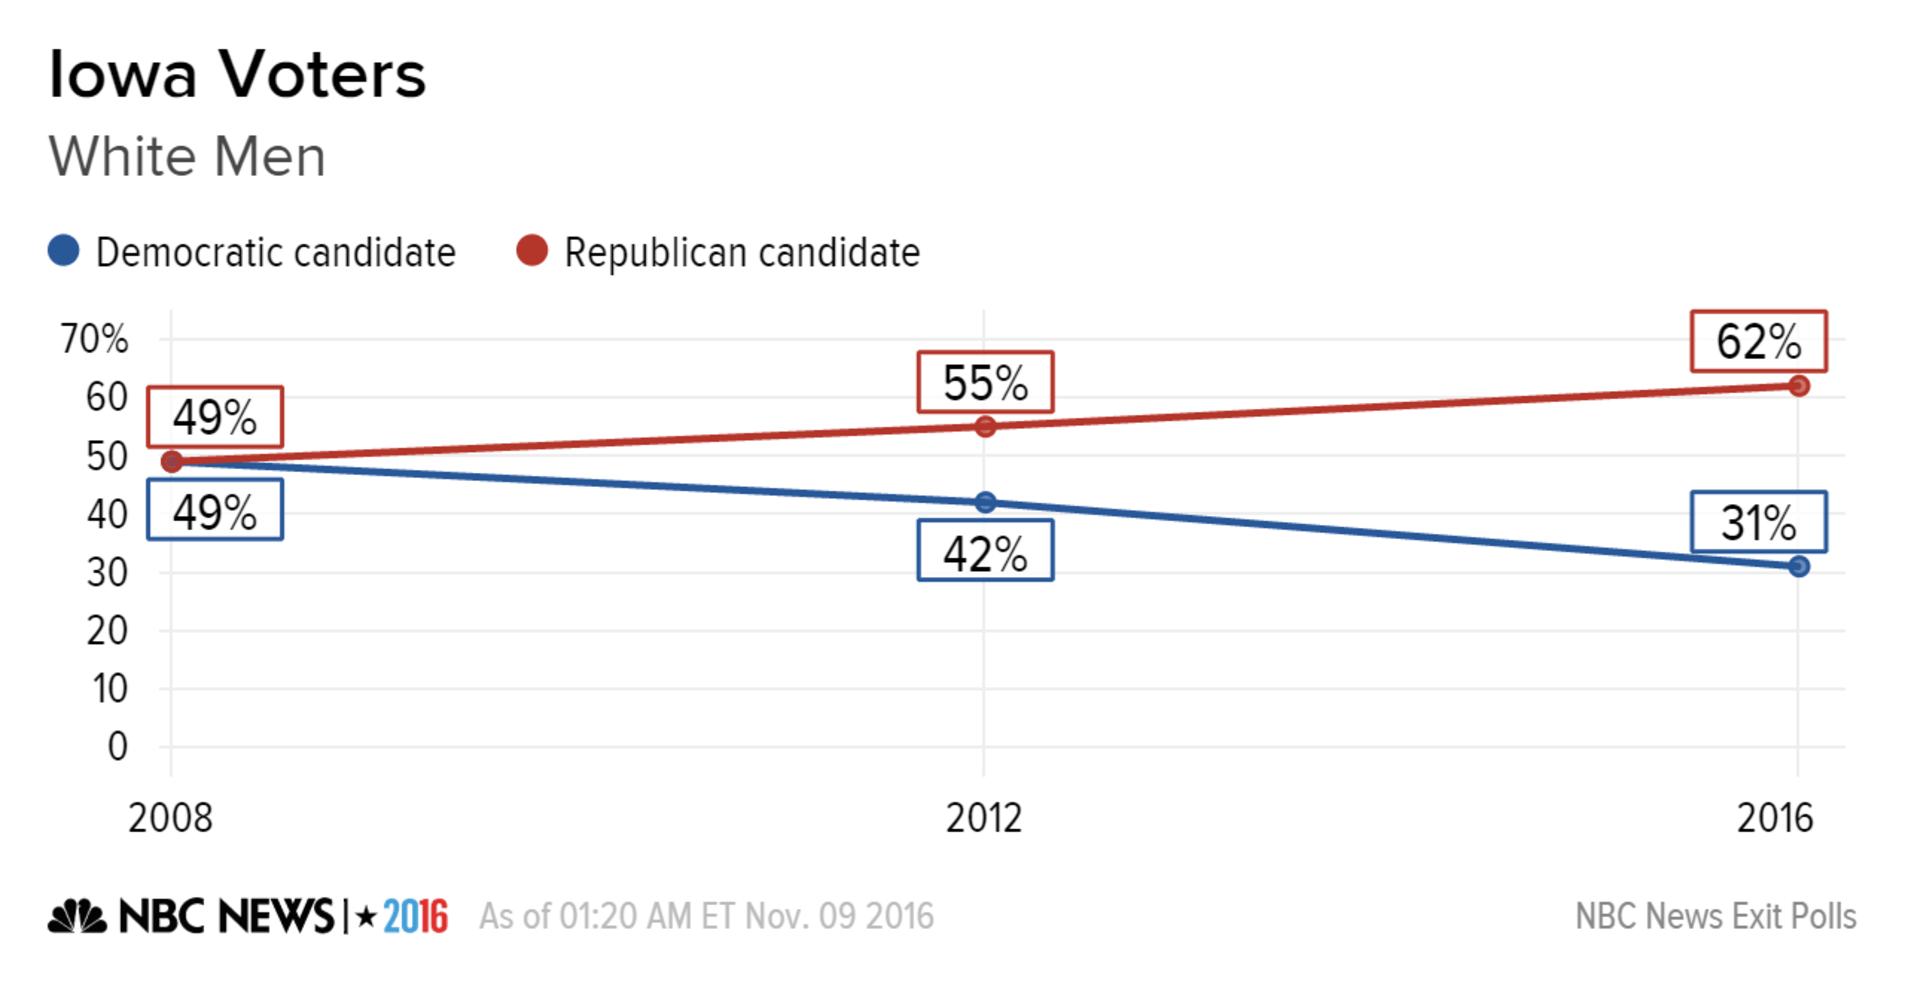 Nbc News Exit Poll In Iowa White Men Abandon Democrats